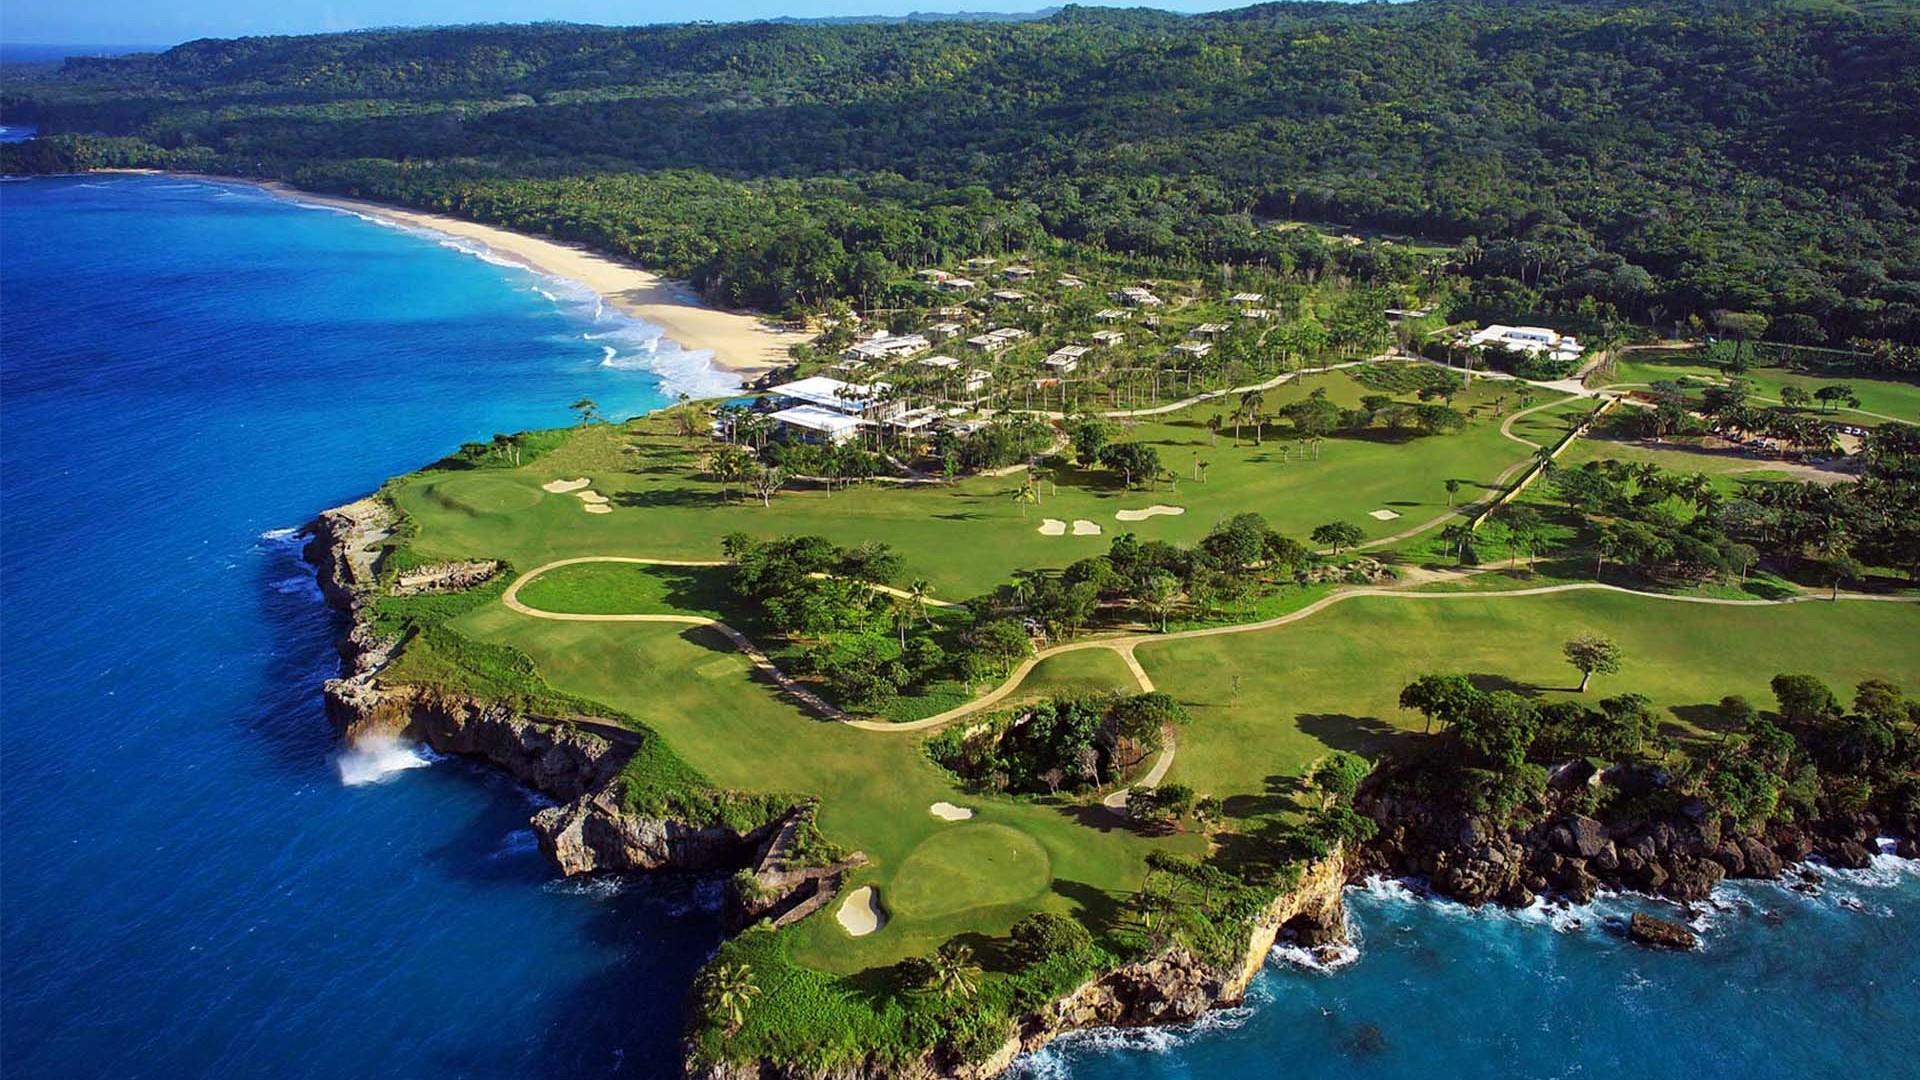 Playa Grande golf course, Dominican Republic